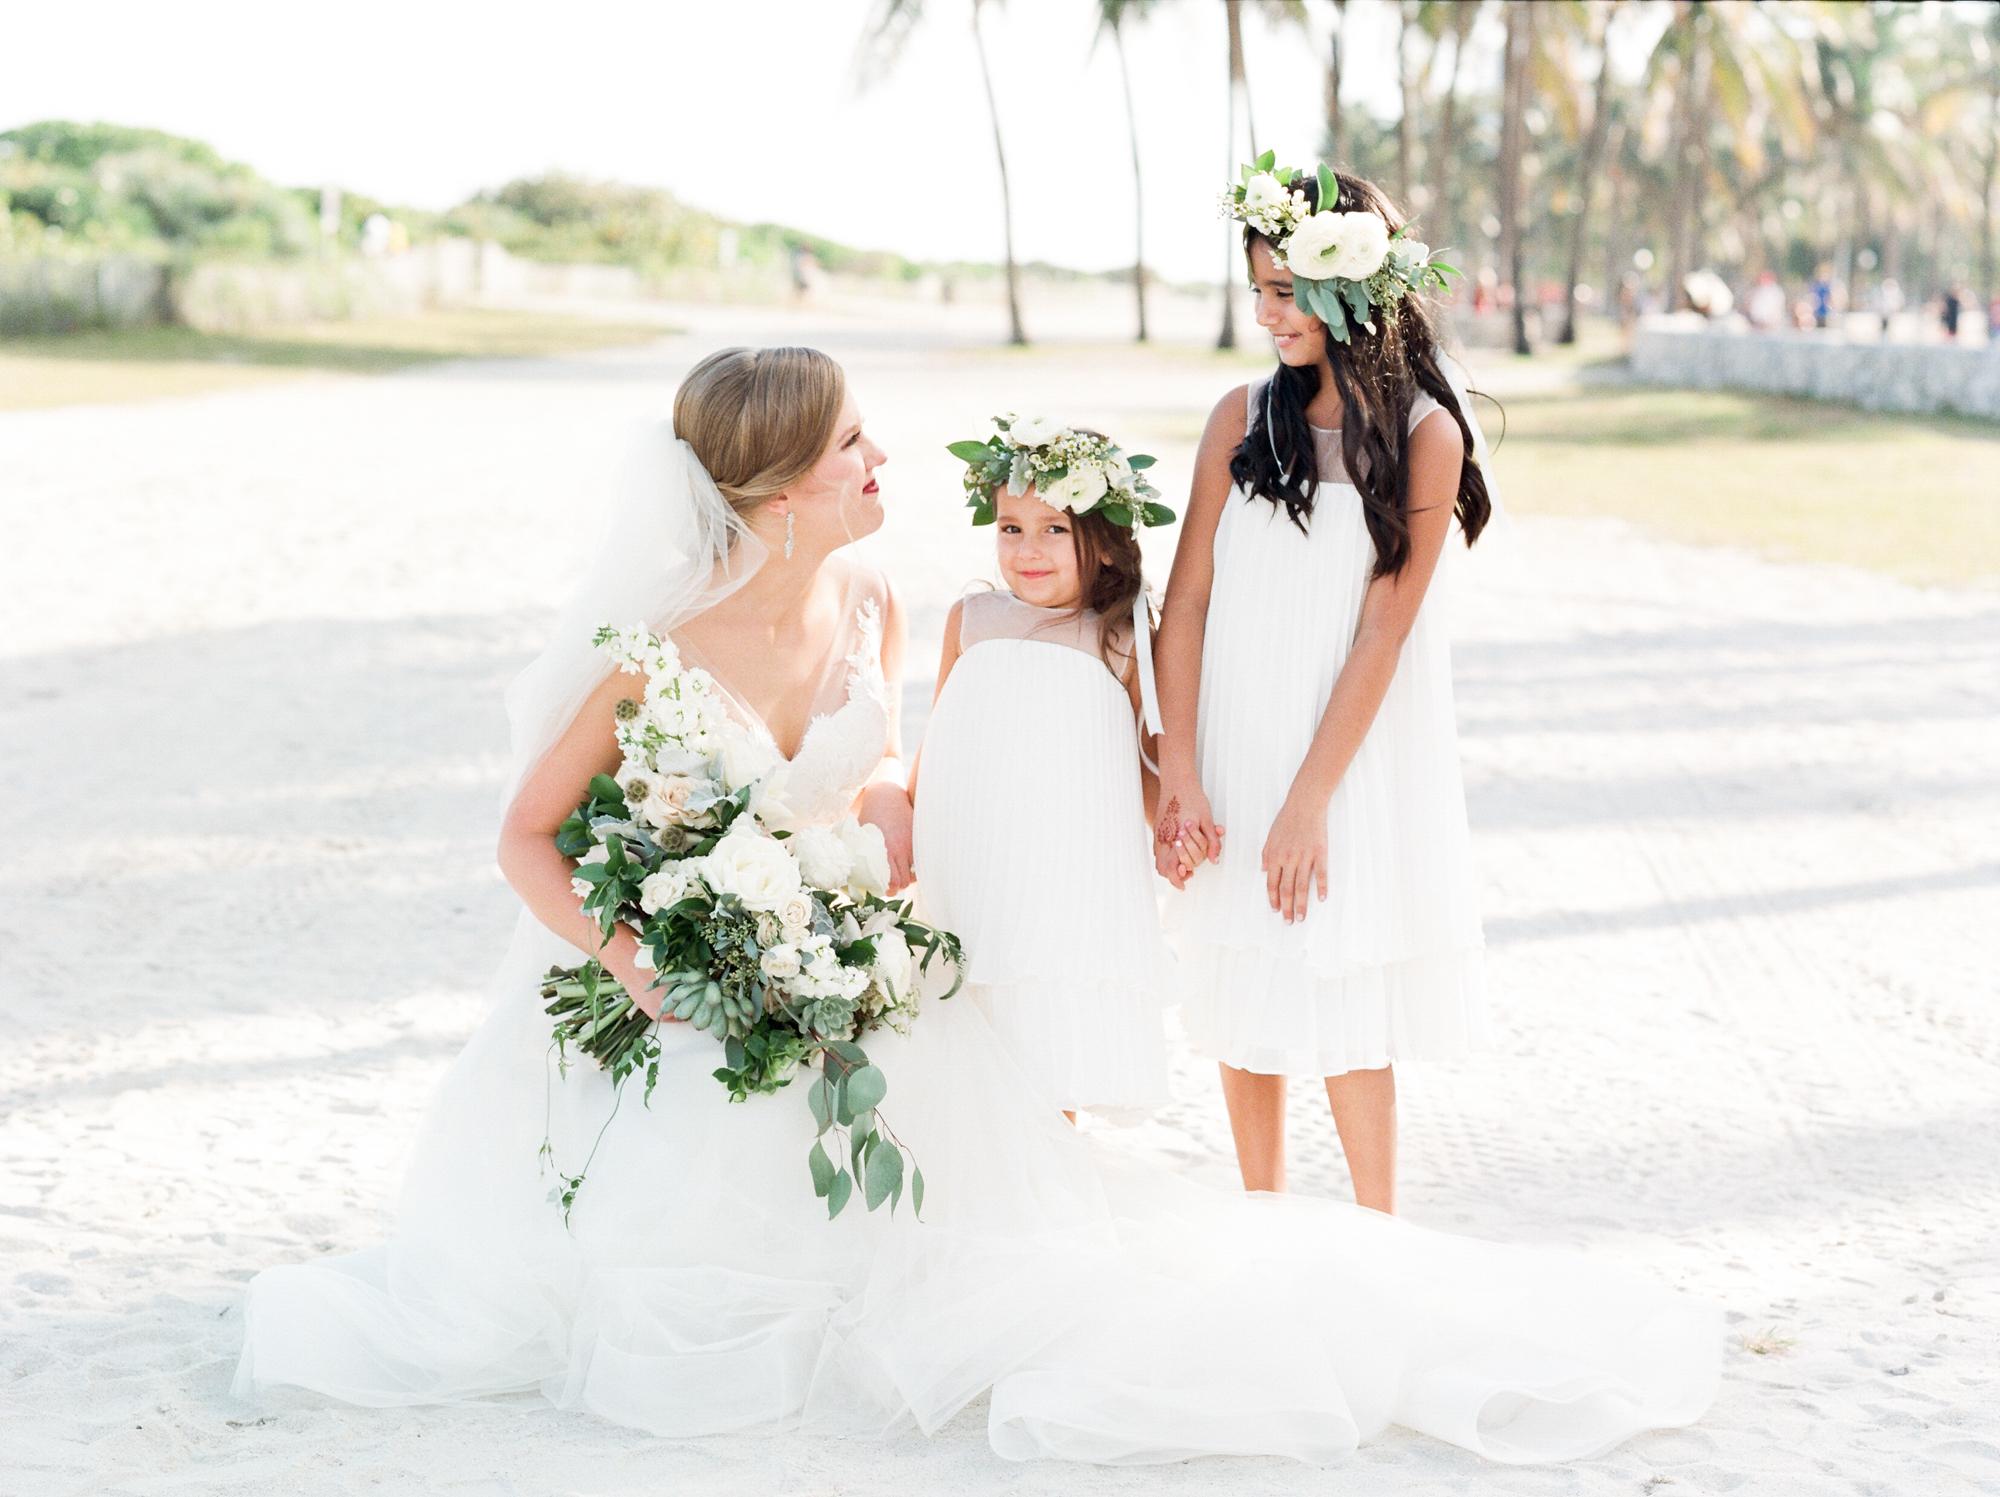 betsy-hotel-wedding-south-beach-miami-charleston-south-carolina-destination-wedding-photographer-18.jpg